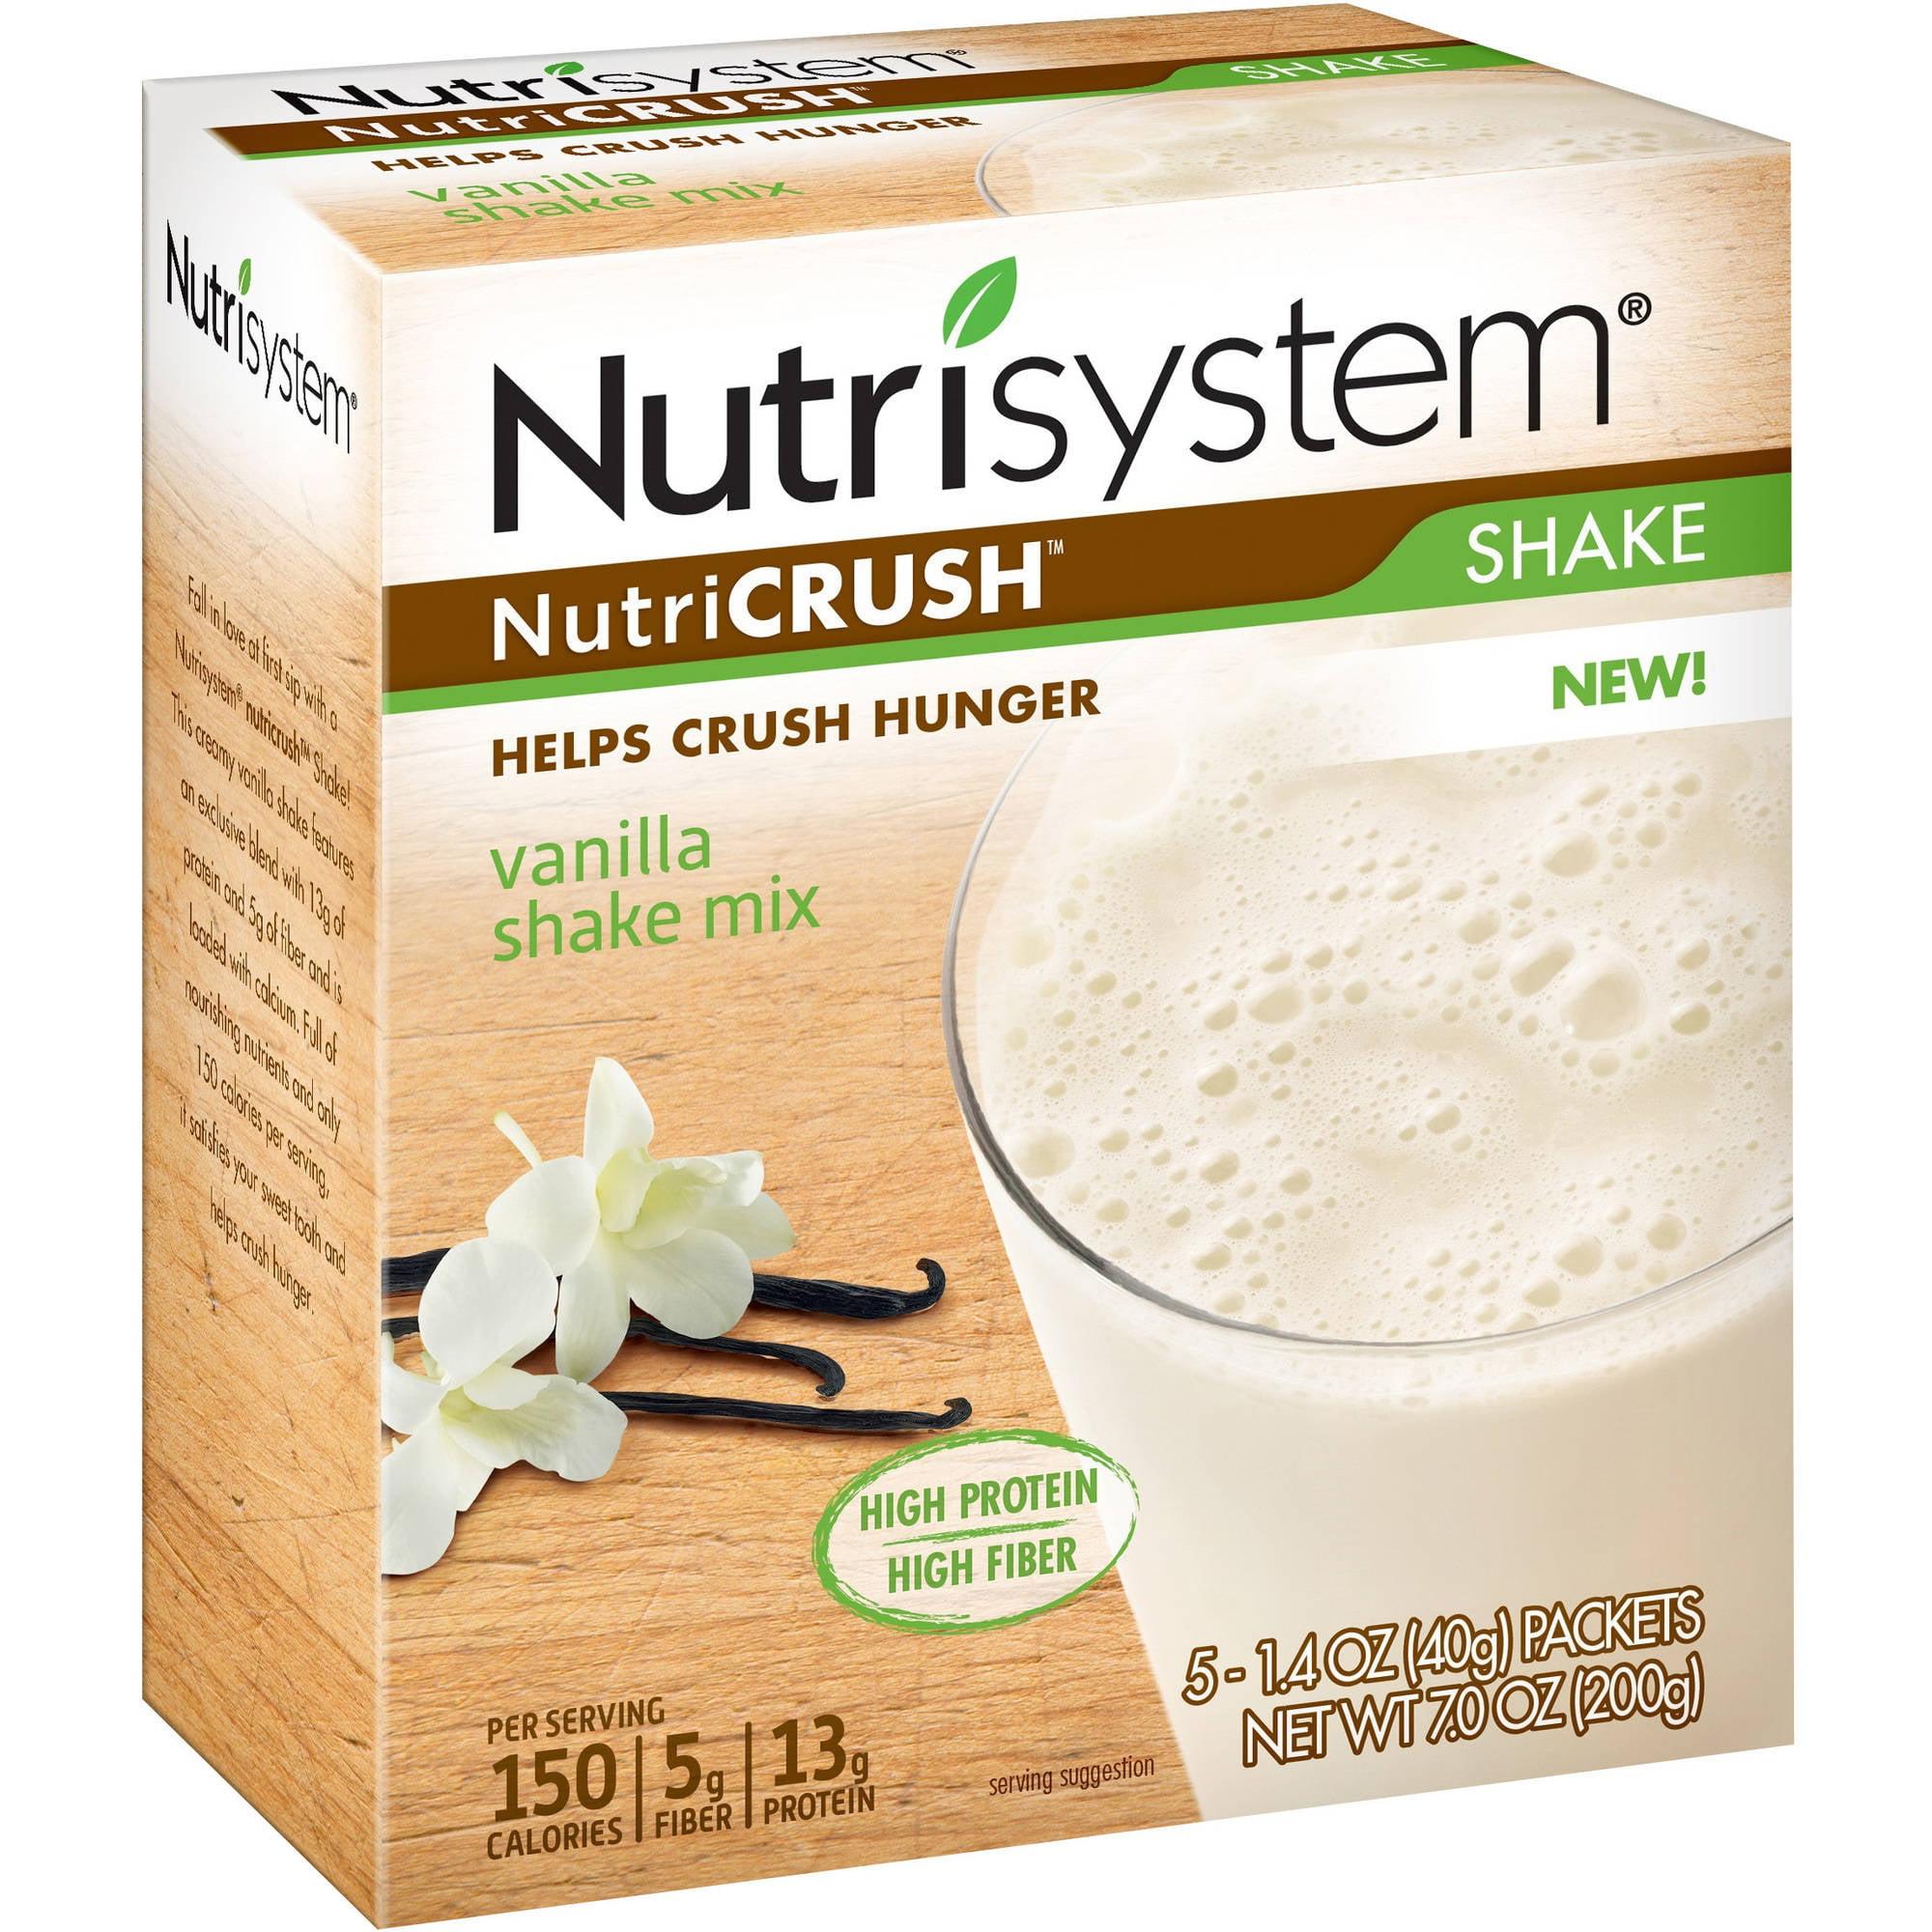 Nutrisystem NutriCrush Vanilla Shake Mix, 1.4 Oz, 5 Ct